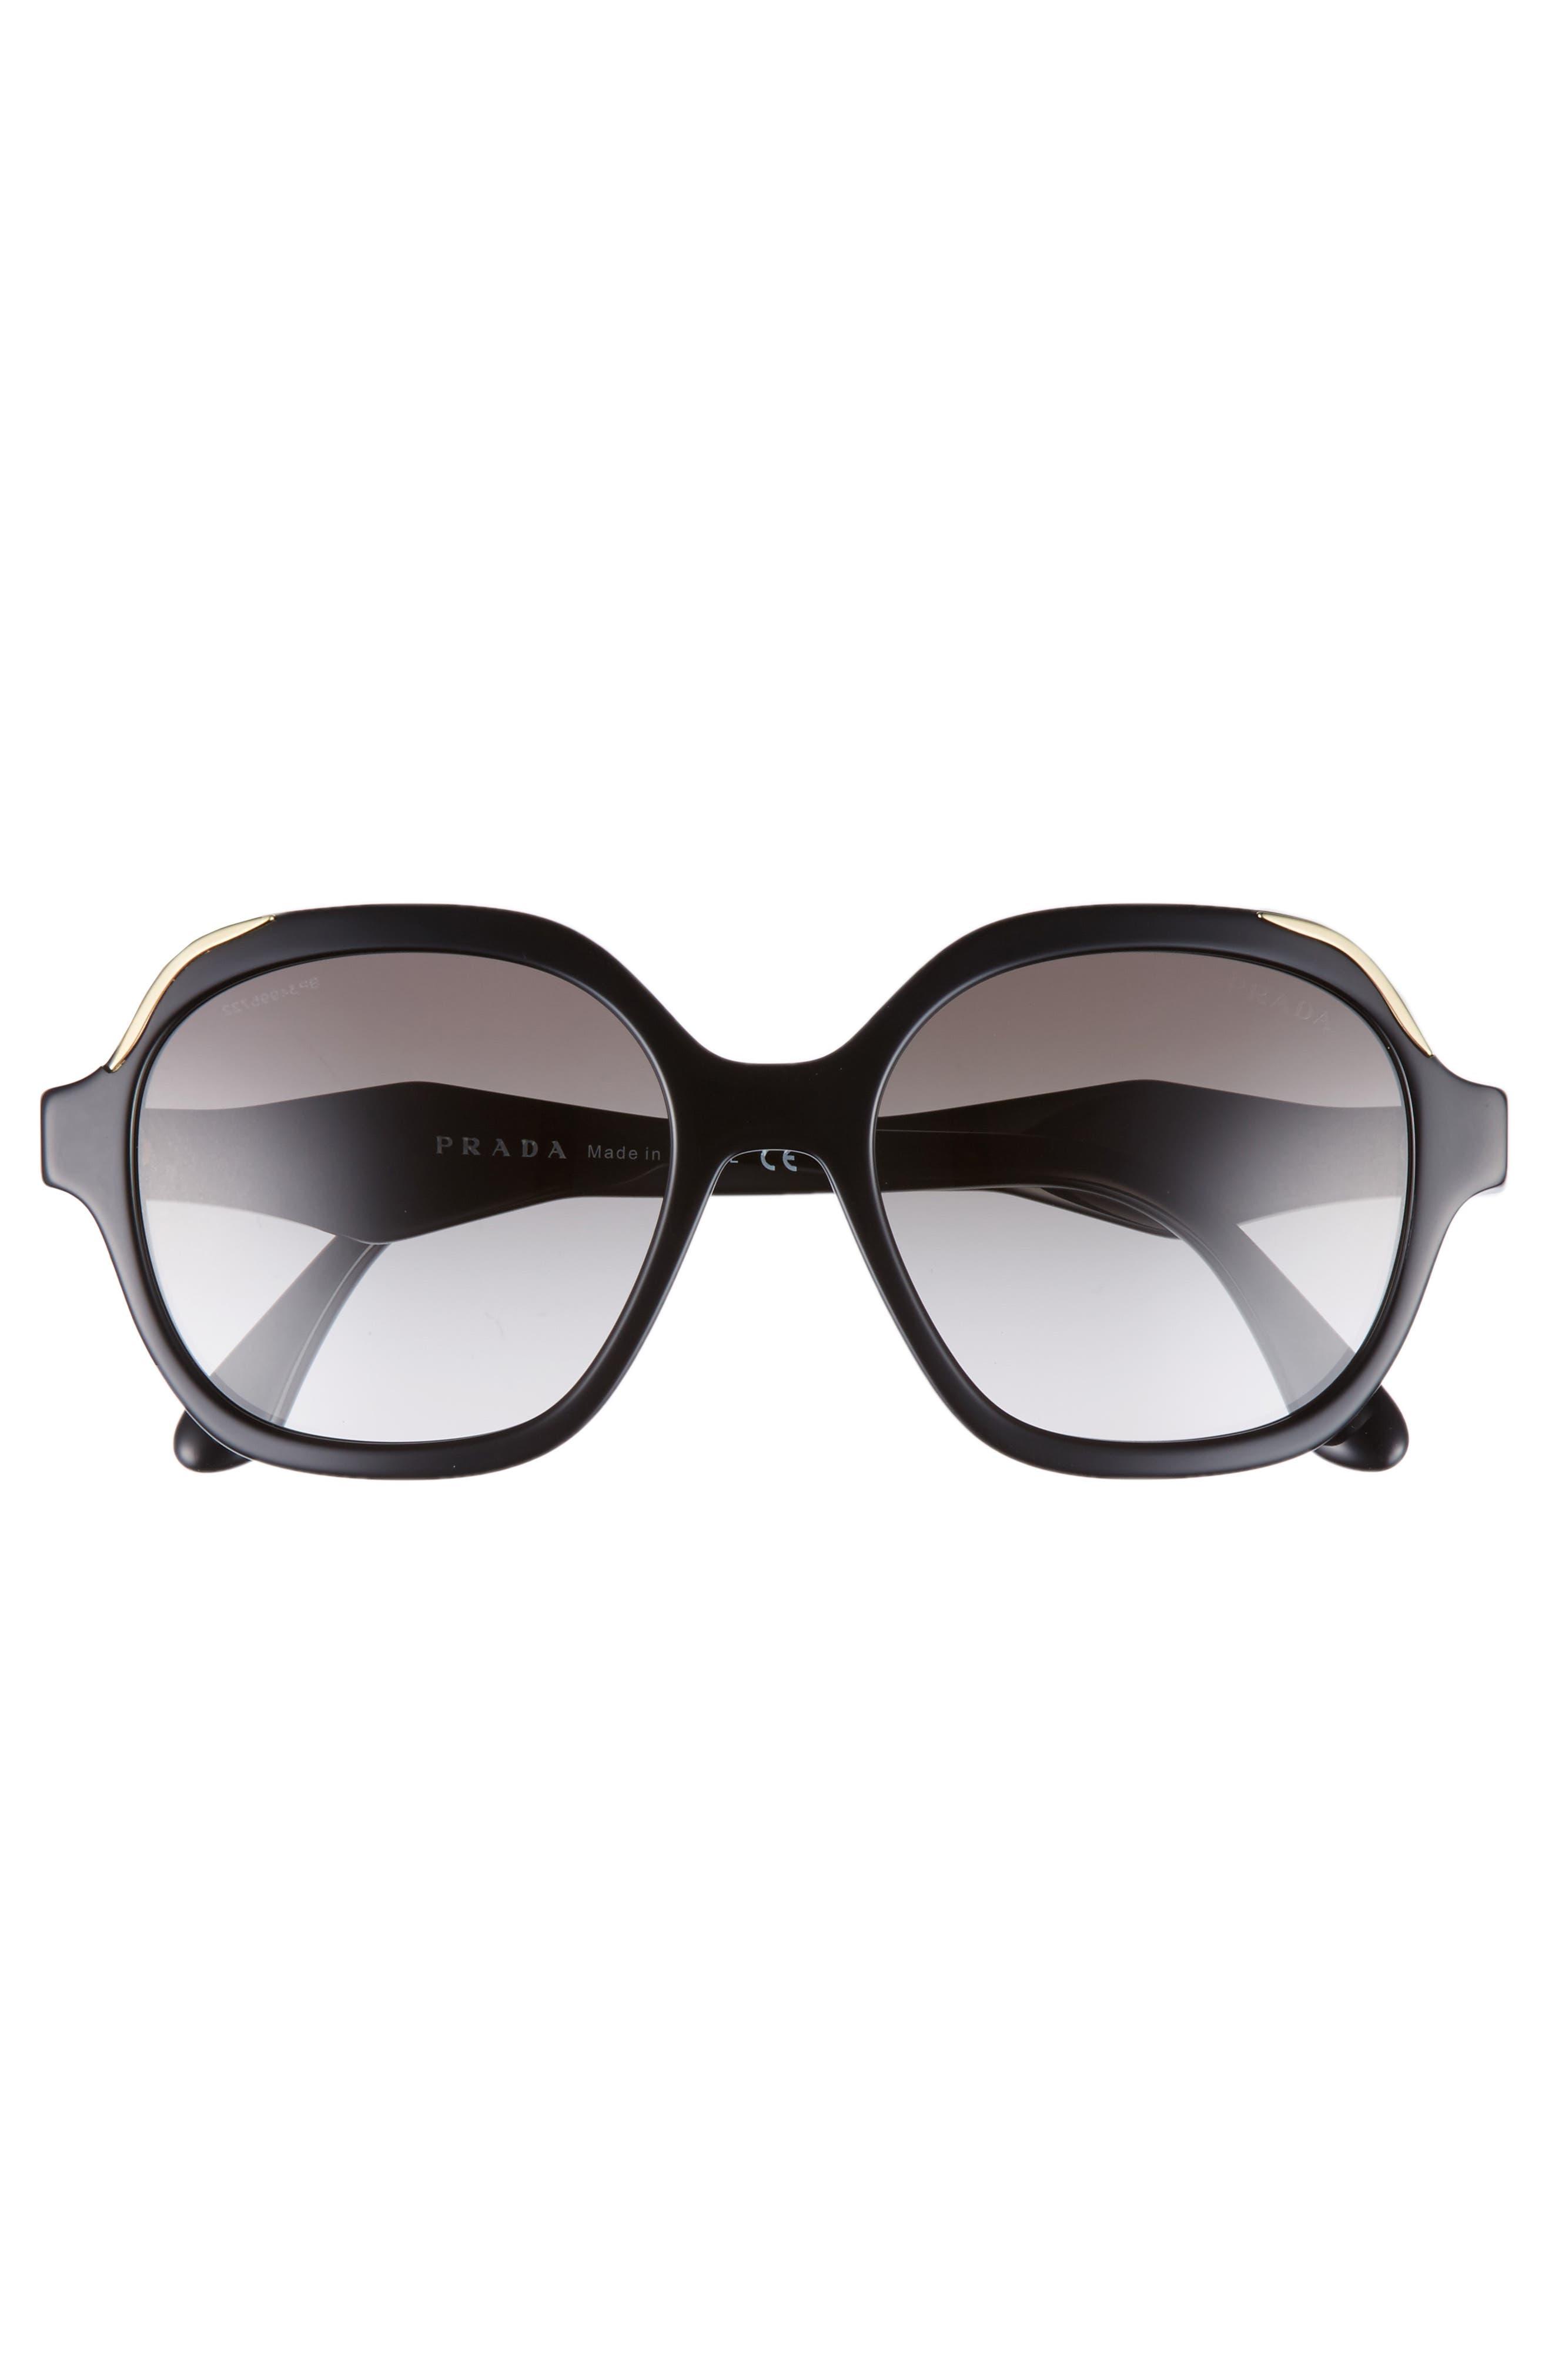 52mm Geometric Gradient Sunglasses,                             Alternate thumbnail 7, color,